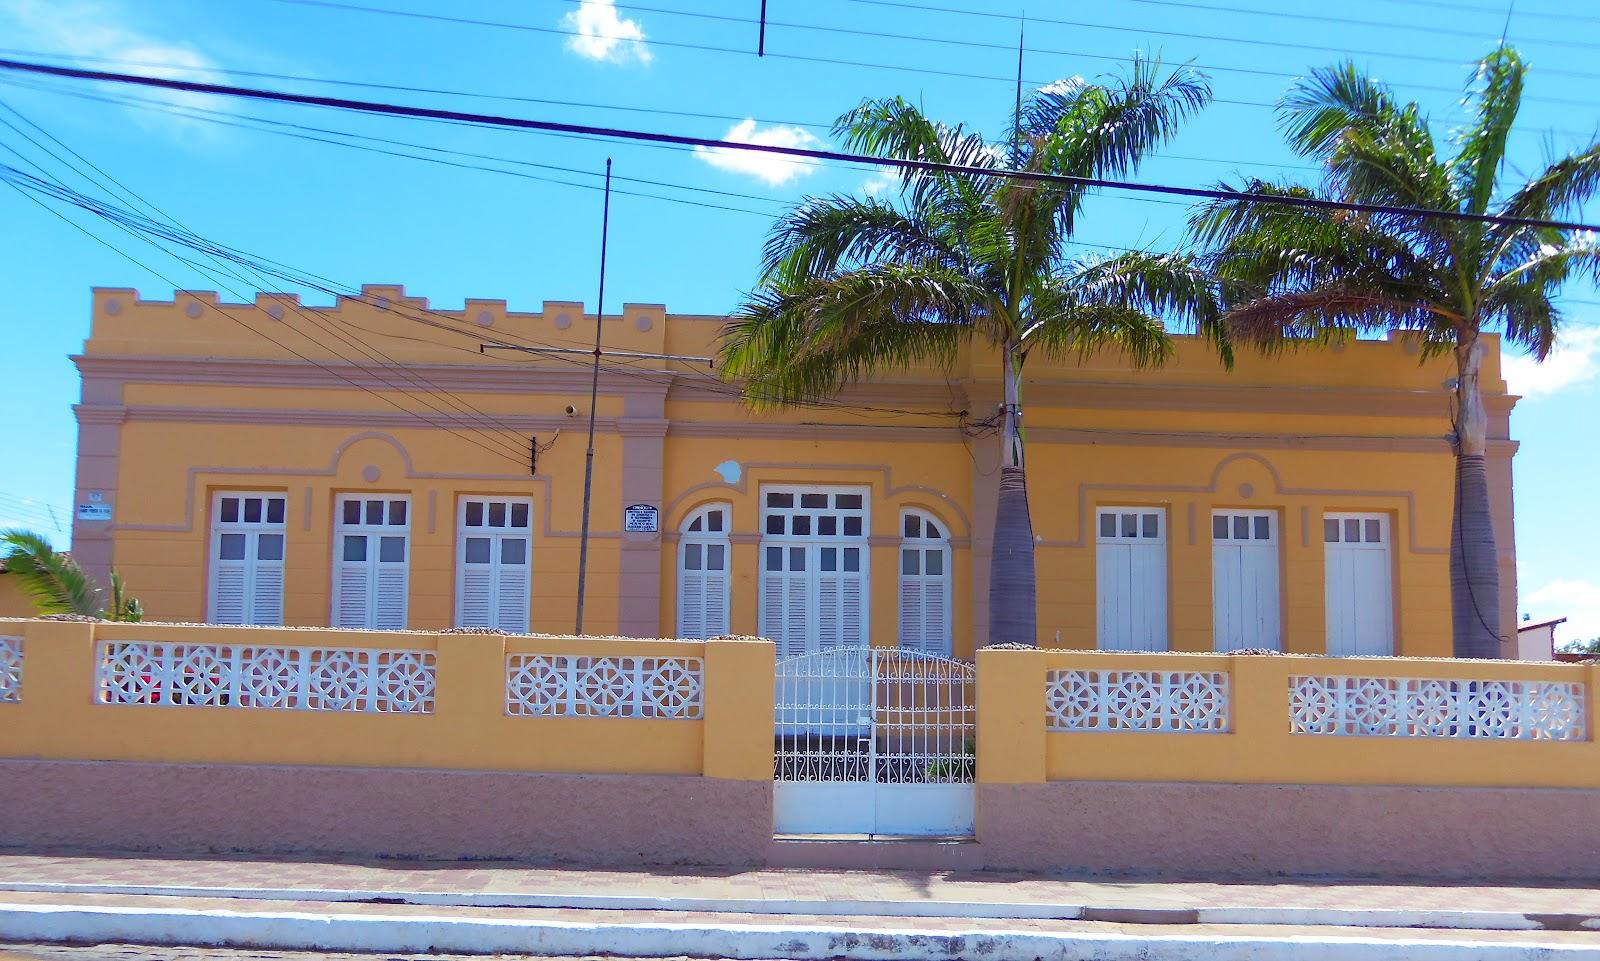 Prefeitura de Lajes RN divulga edital de concurso público com 80 vagas